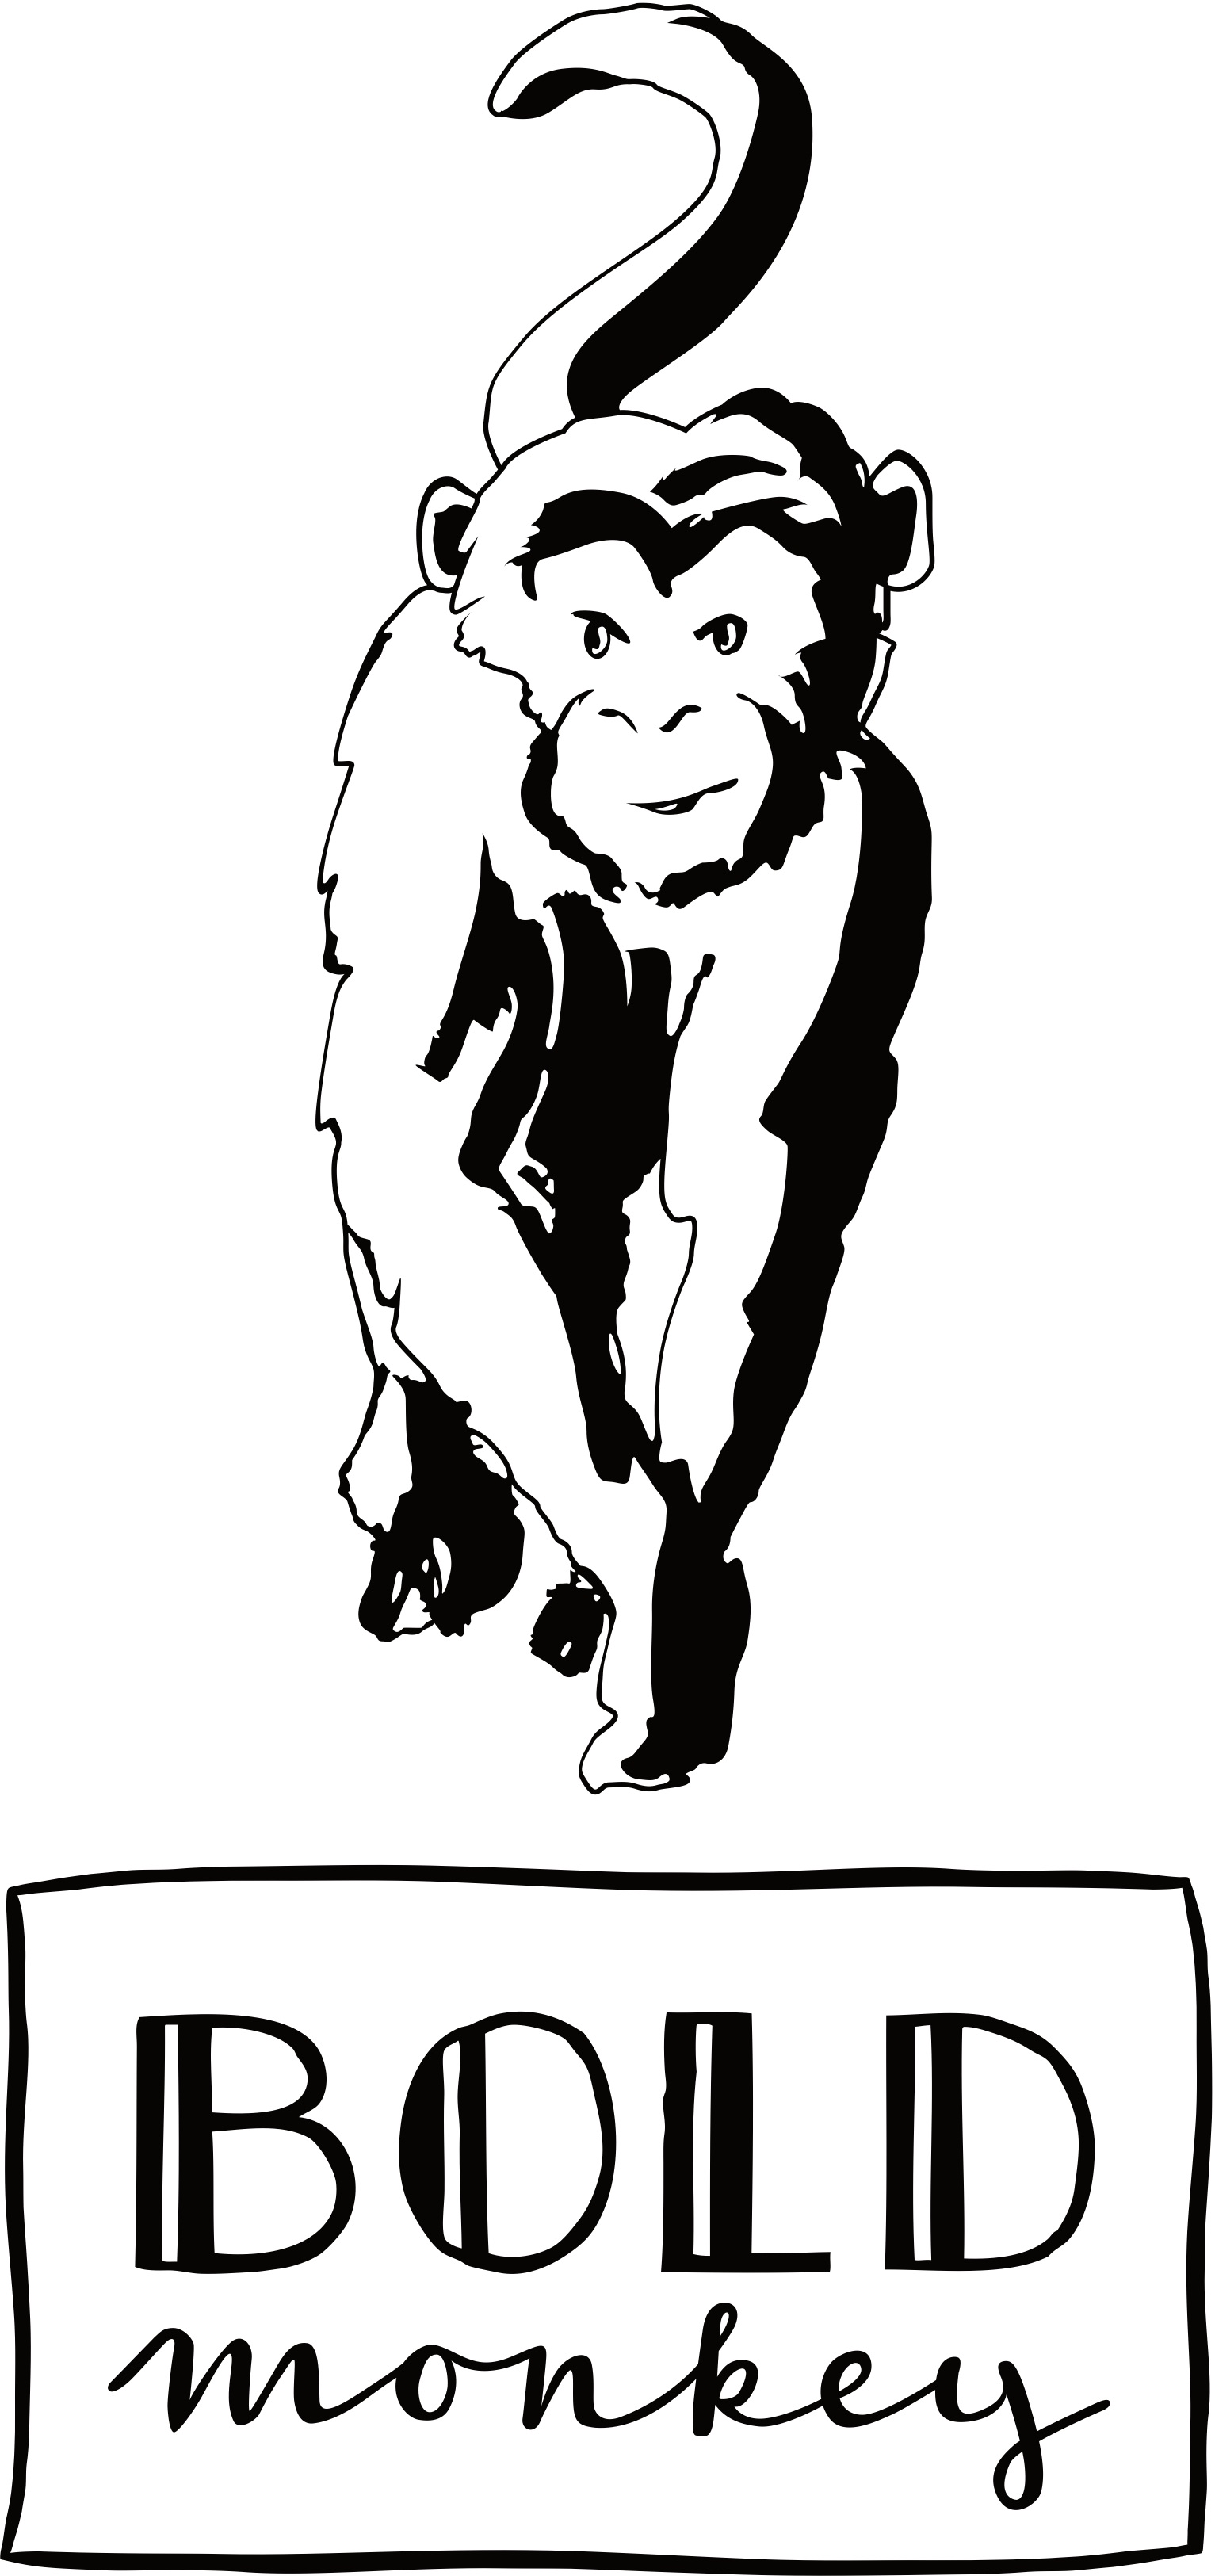 Bold Monkey Kiss the froggy stoel eetkamerstoel vogels en geel frame zijaanzicht